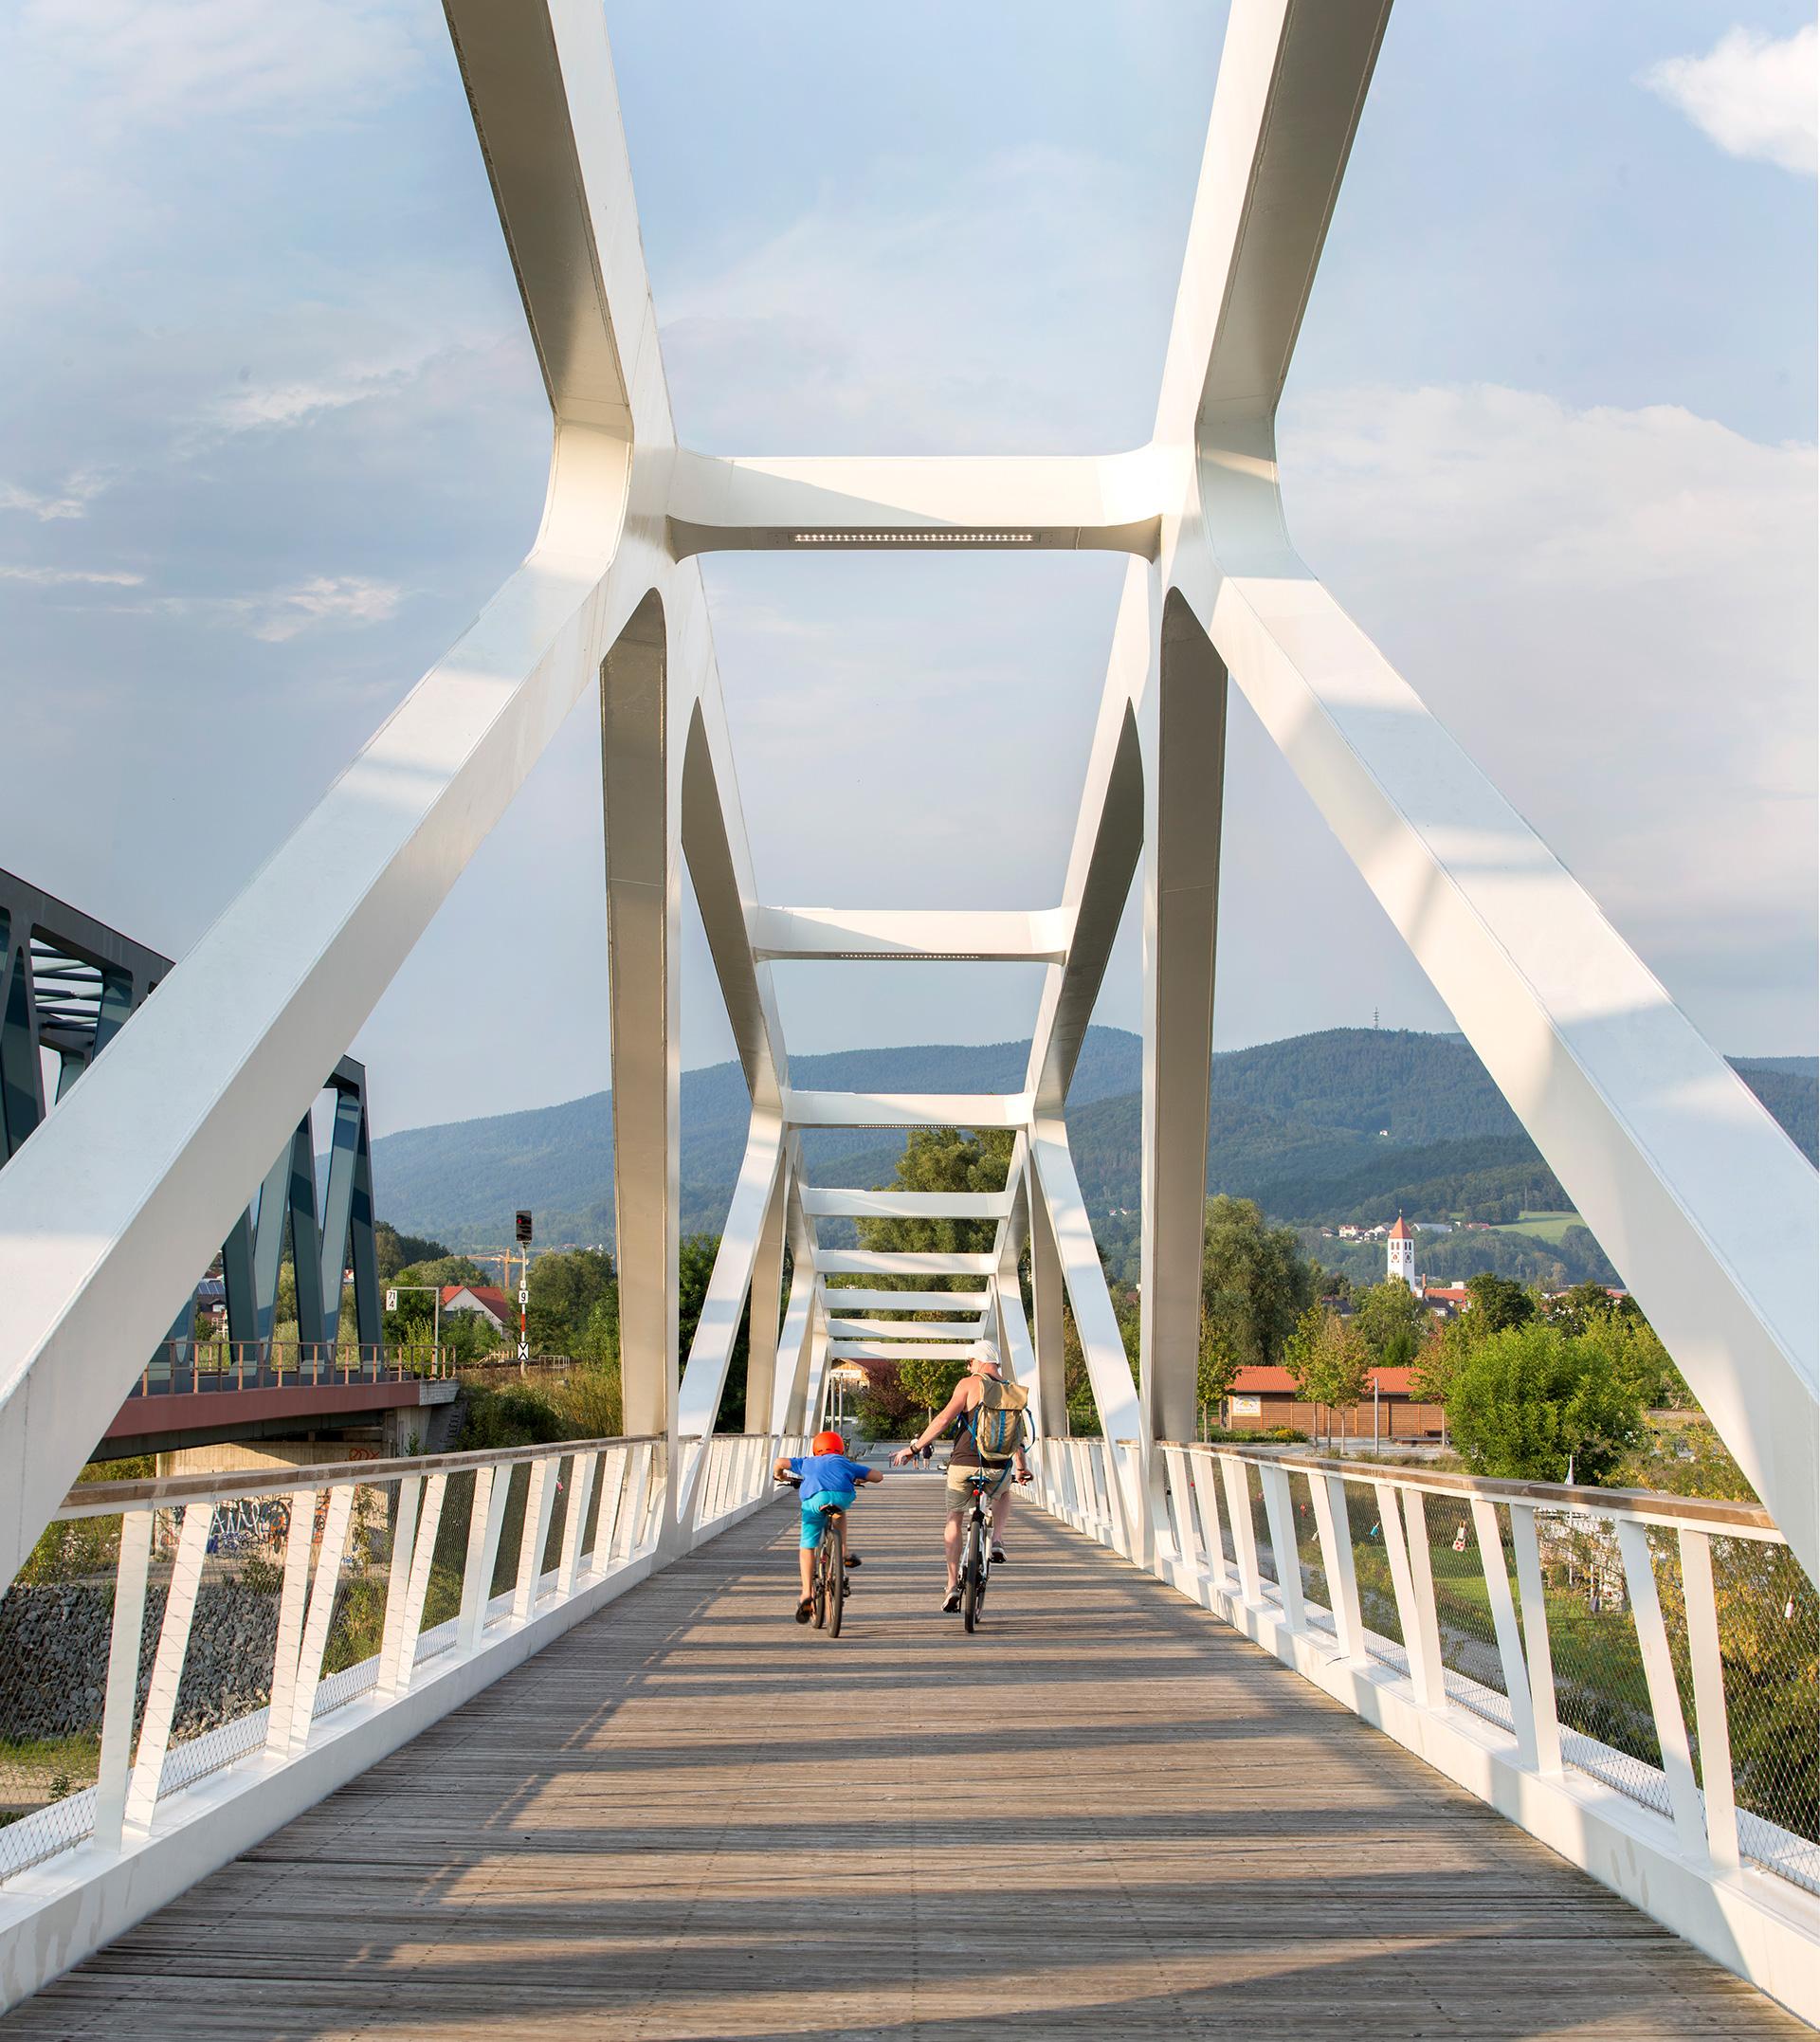 Radbrücke über die Donau